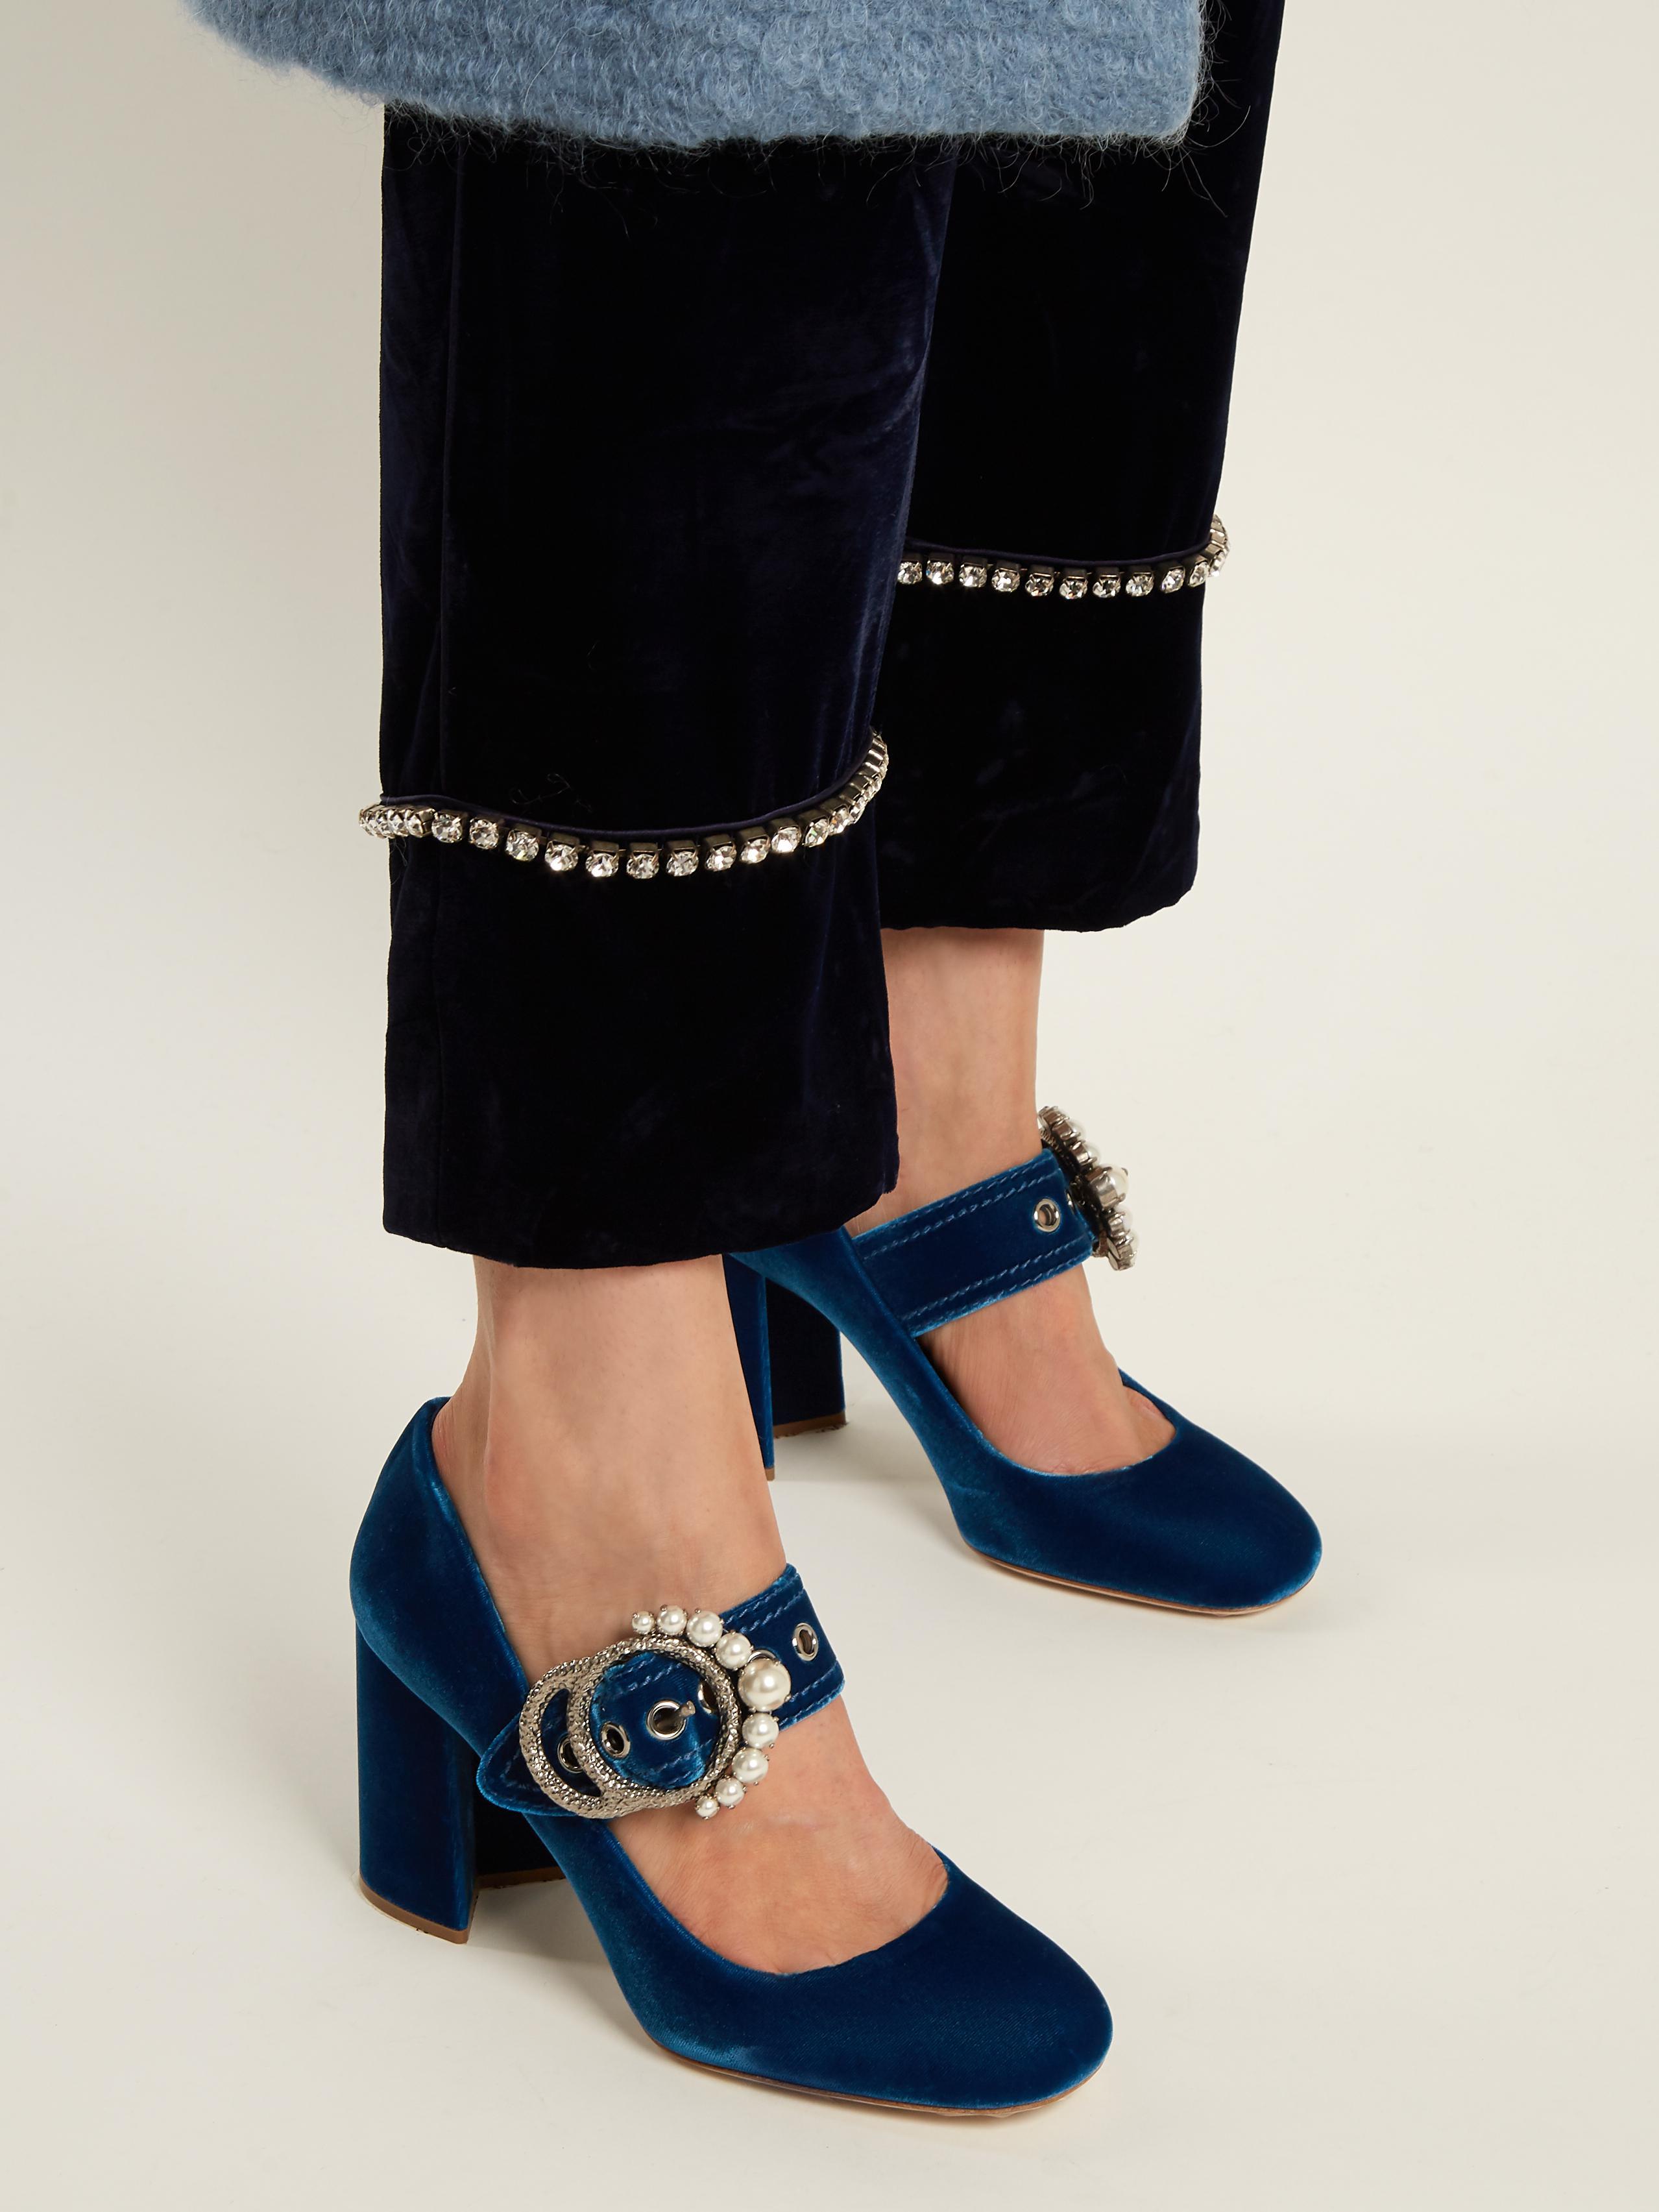 d308863dce9 Lyst - Miu Miu Embellished Velvet Block-heel Pumps in Blue